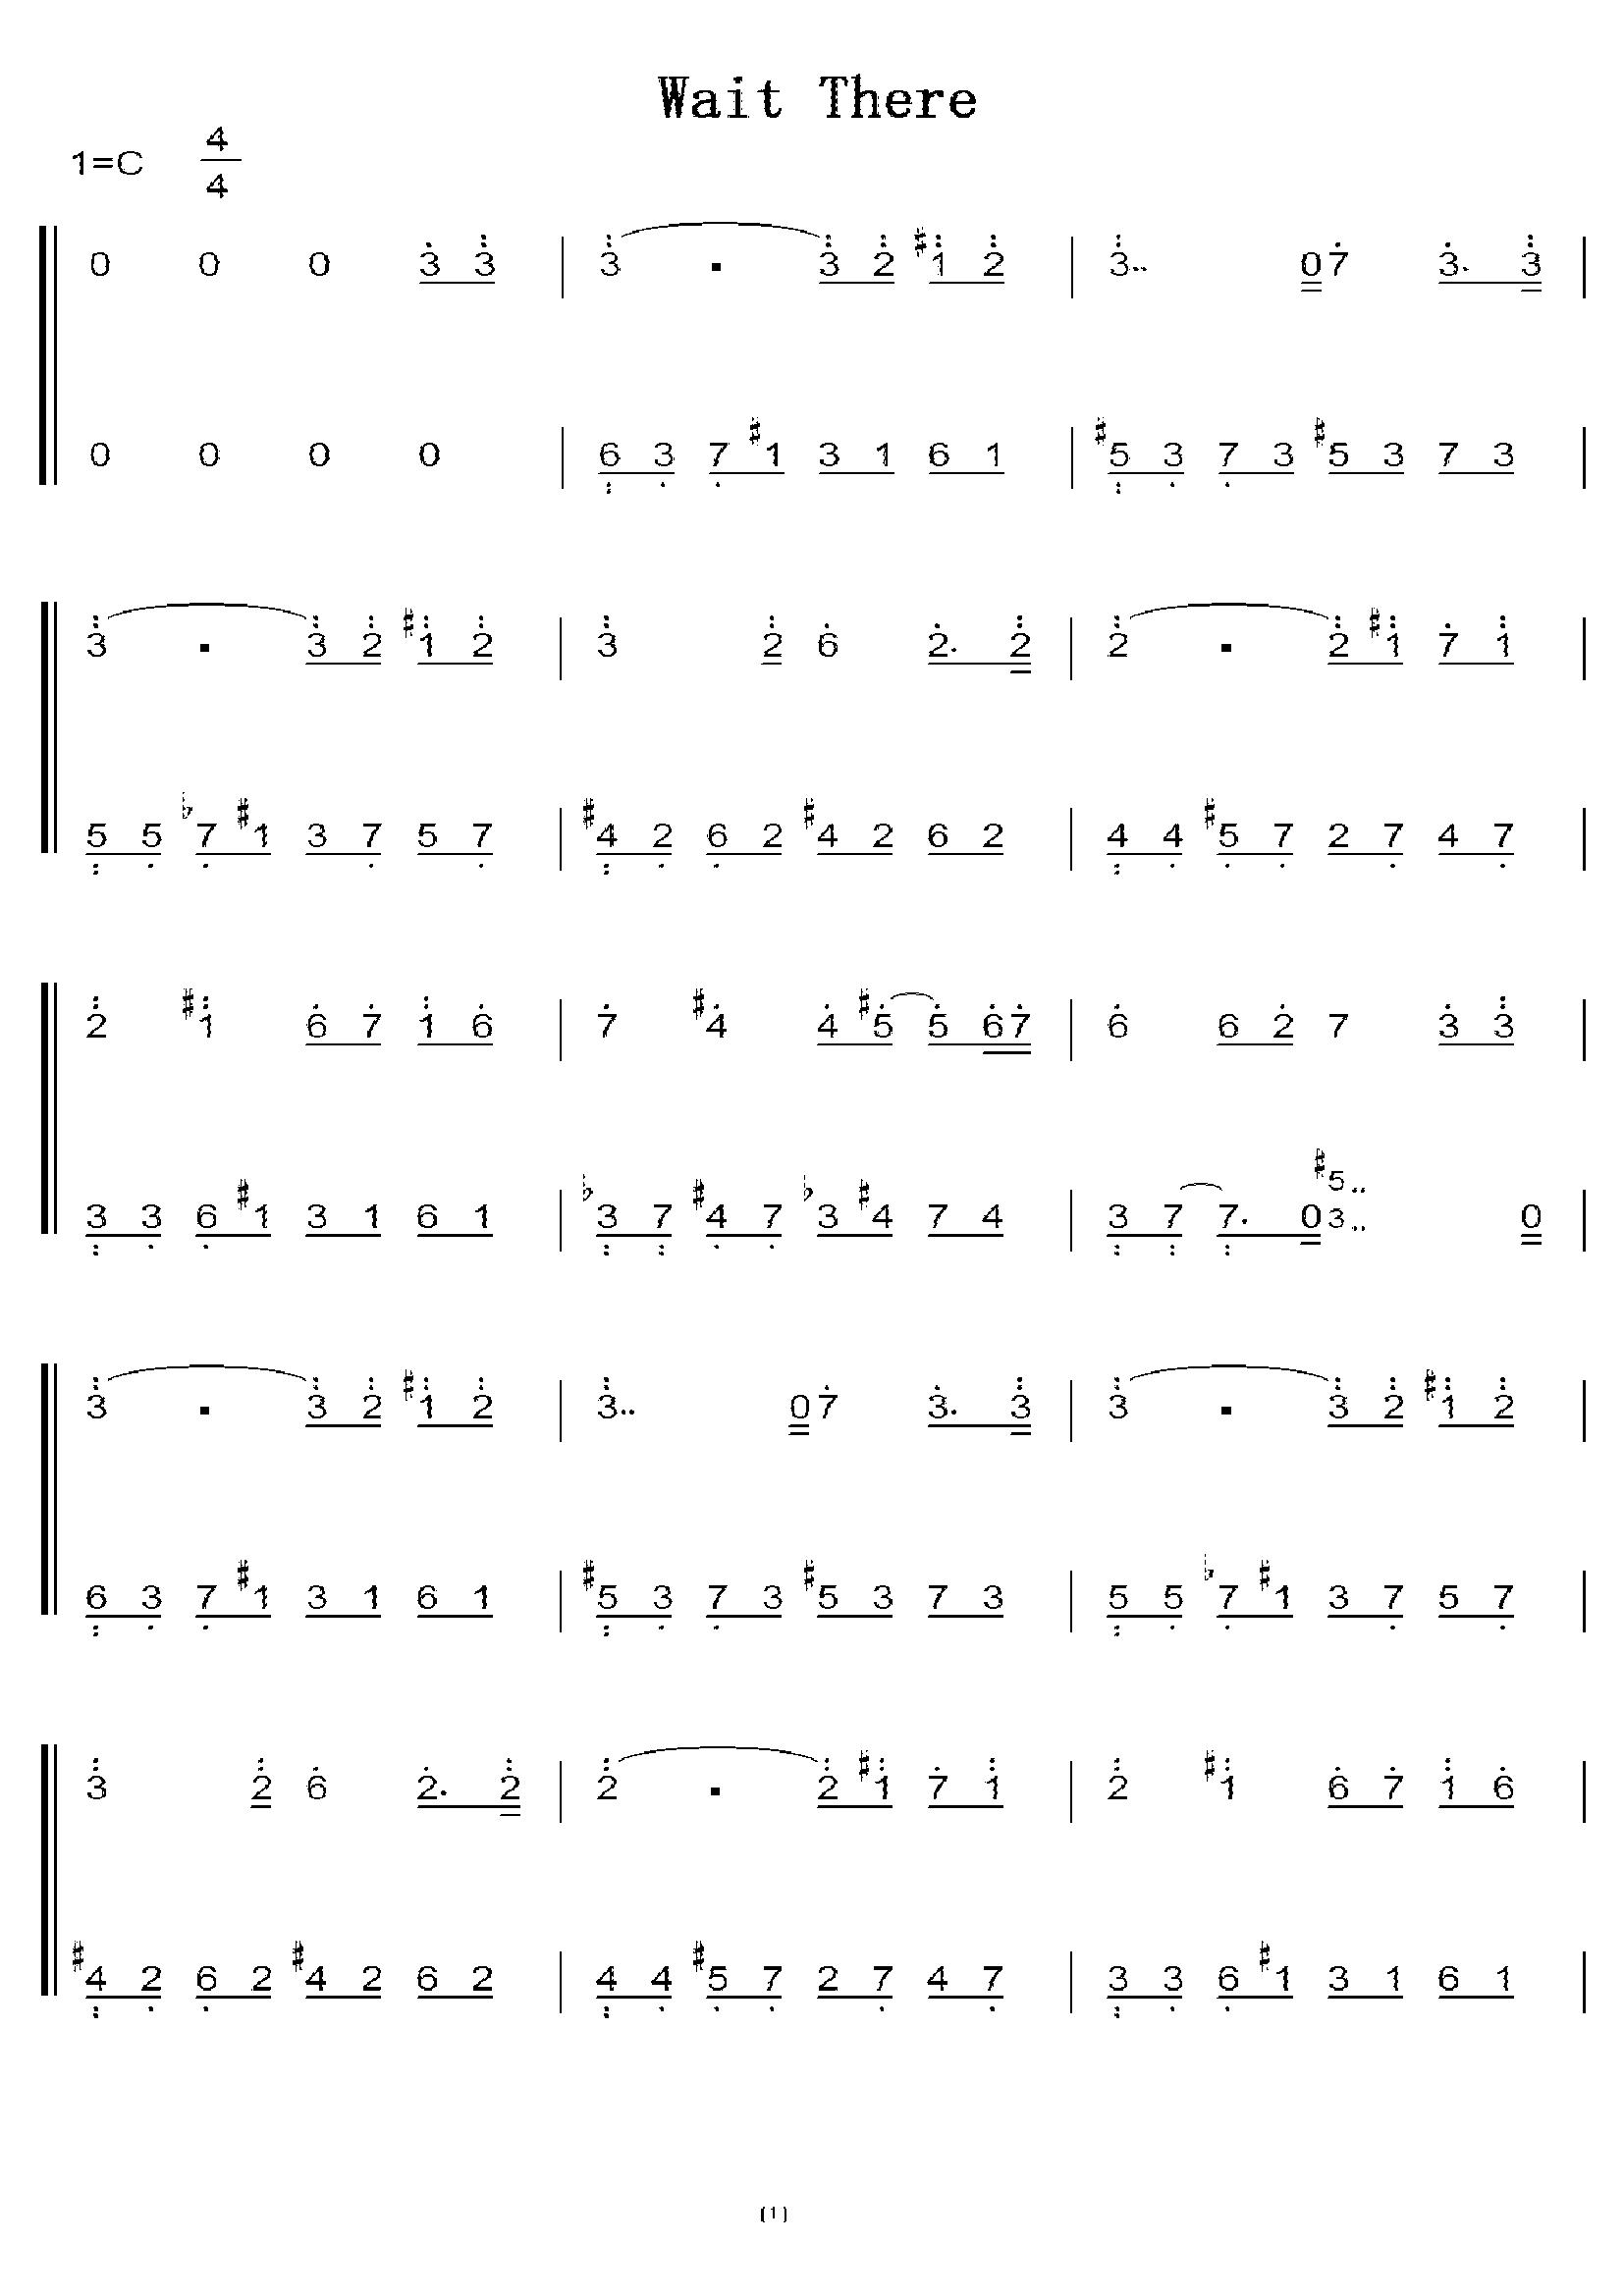 wait there(李闰珉 yiruma) 初学者c调简易版 钢琴双手简谱 钢琴简谱图片